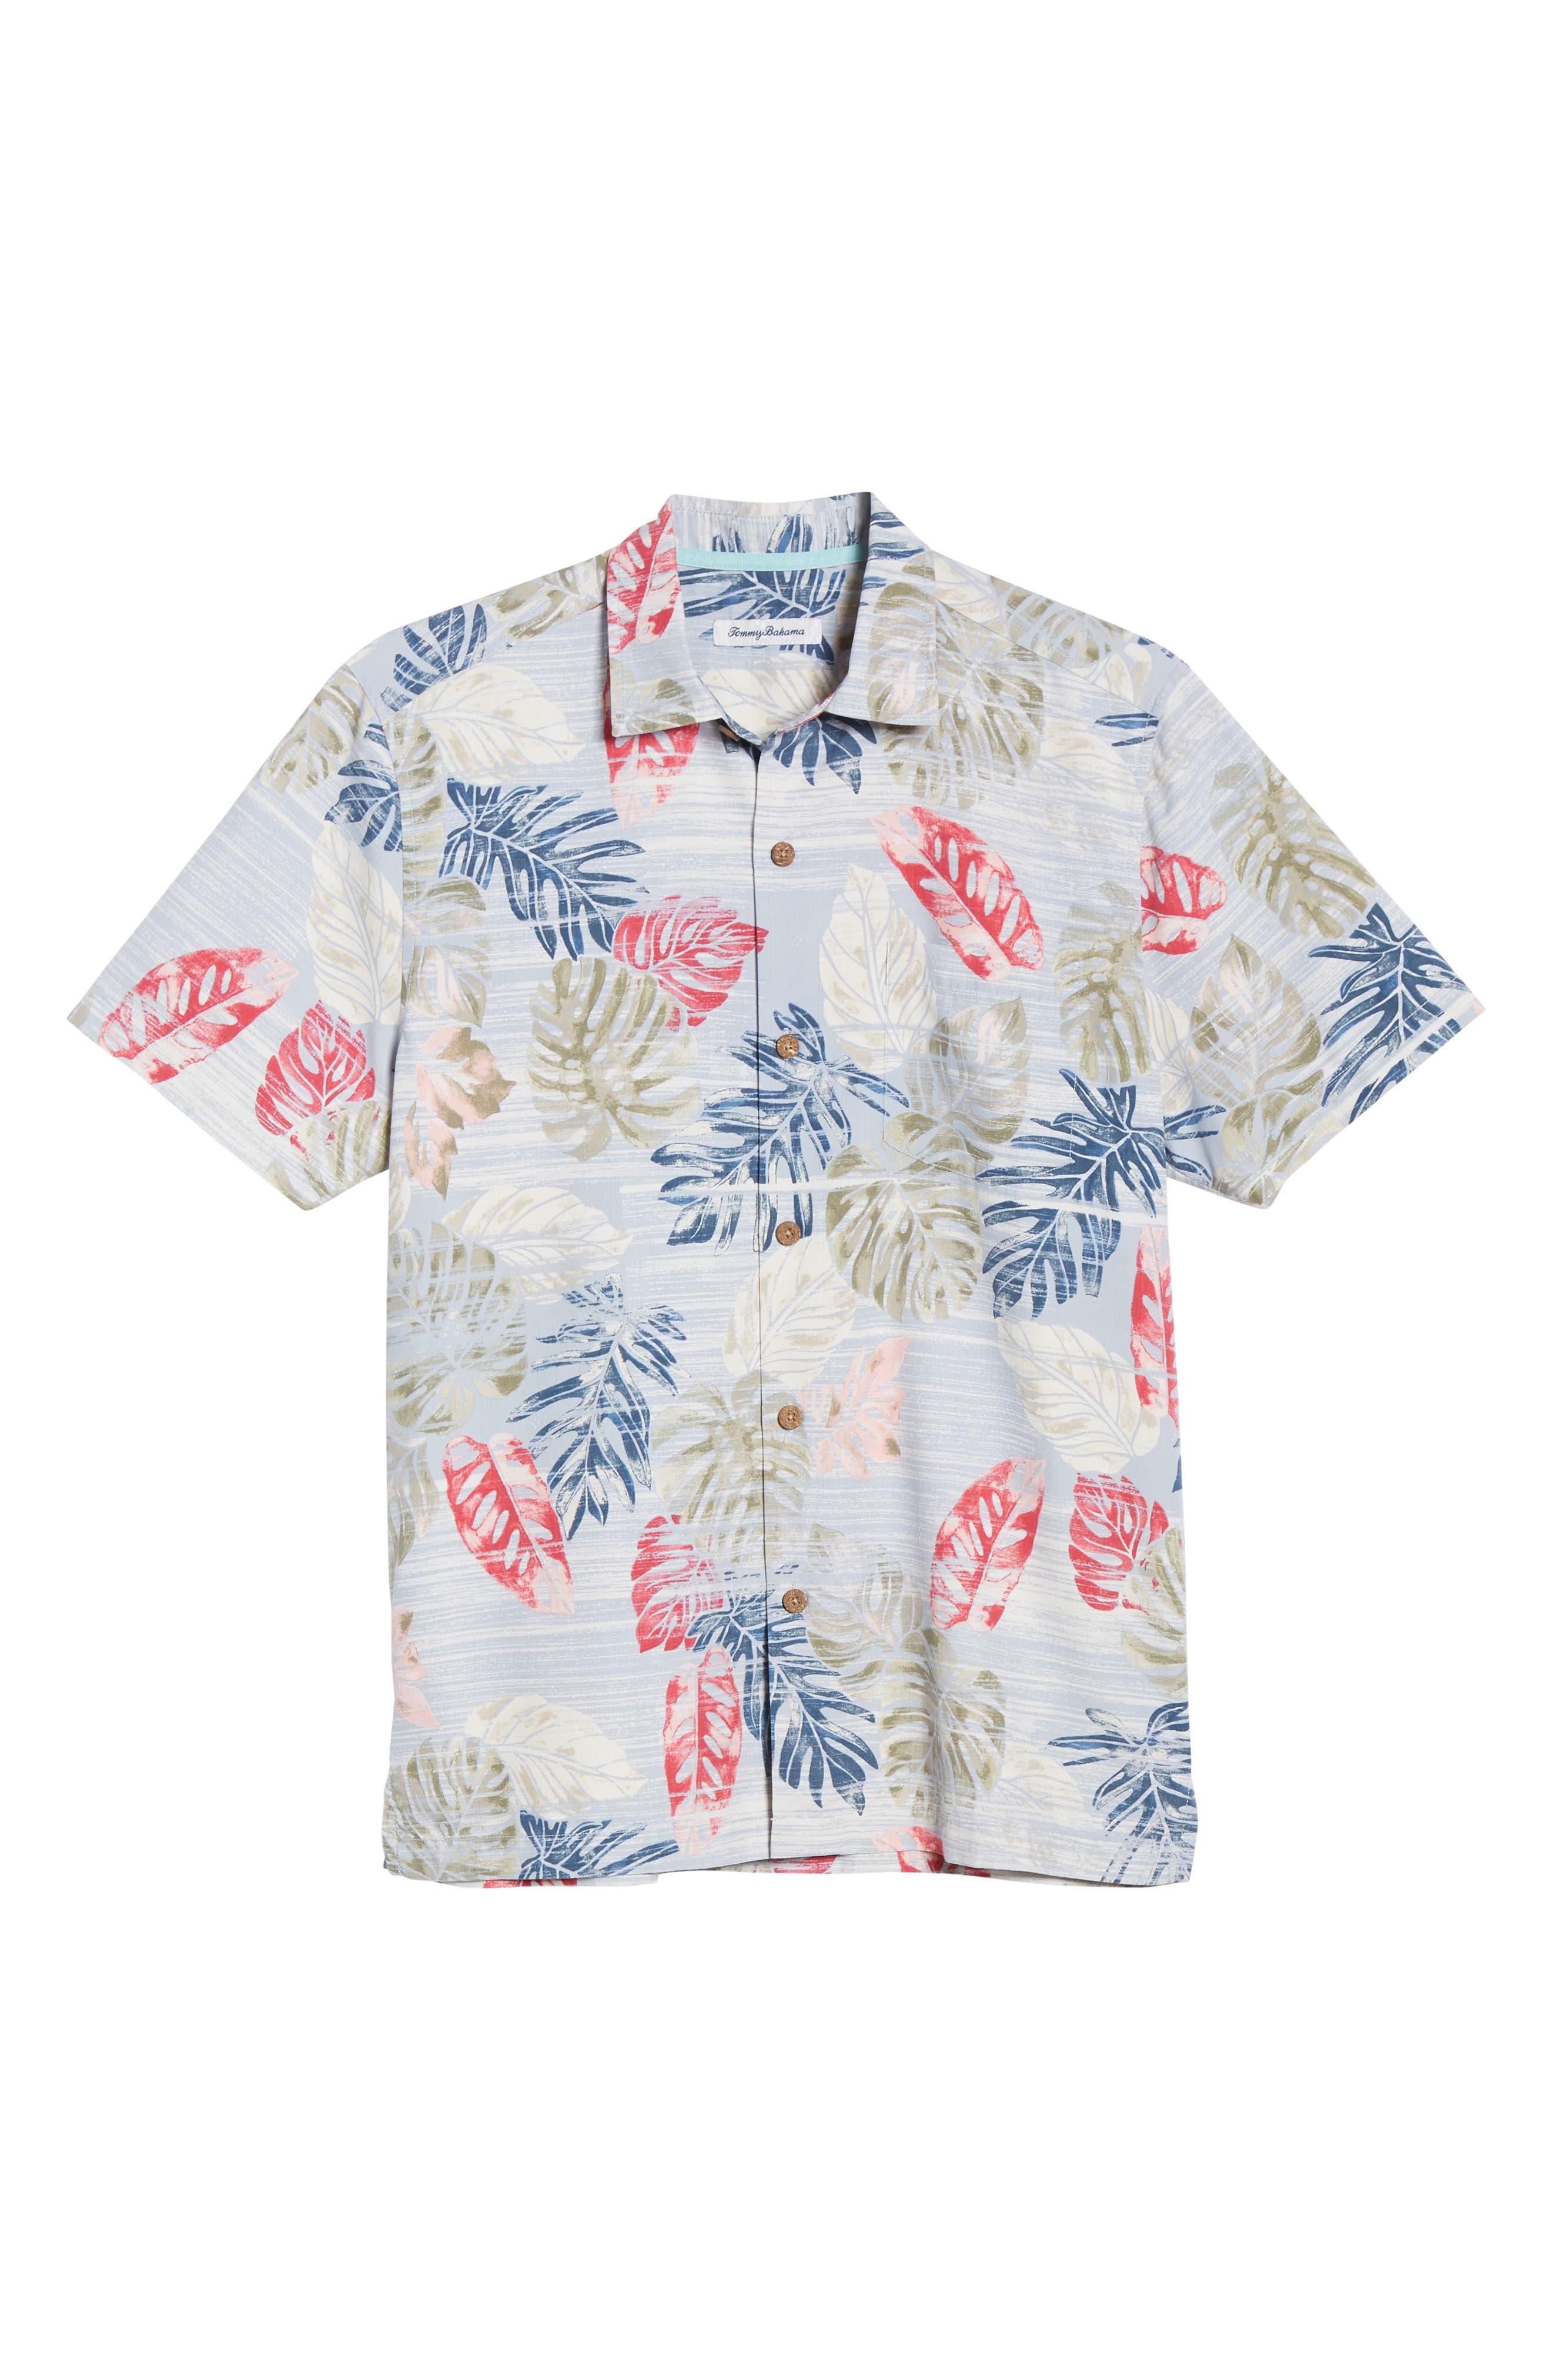 TOMMY BAHAMA,                             Botanica Sketch Silk Blend Shirt,                             Alternate thumbnail 5, color,                             CANYON SKY